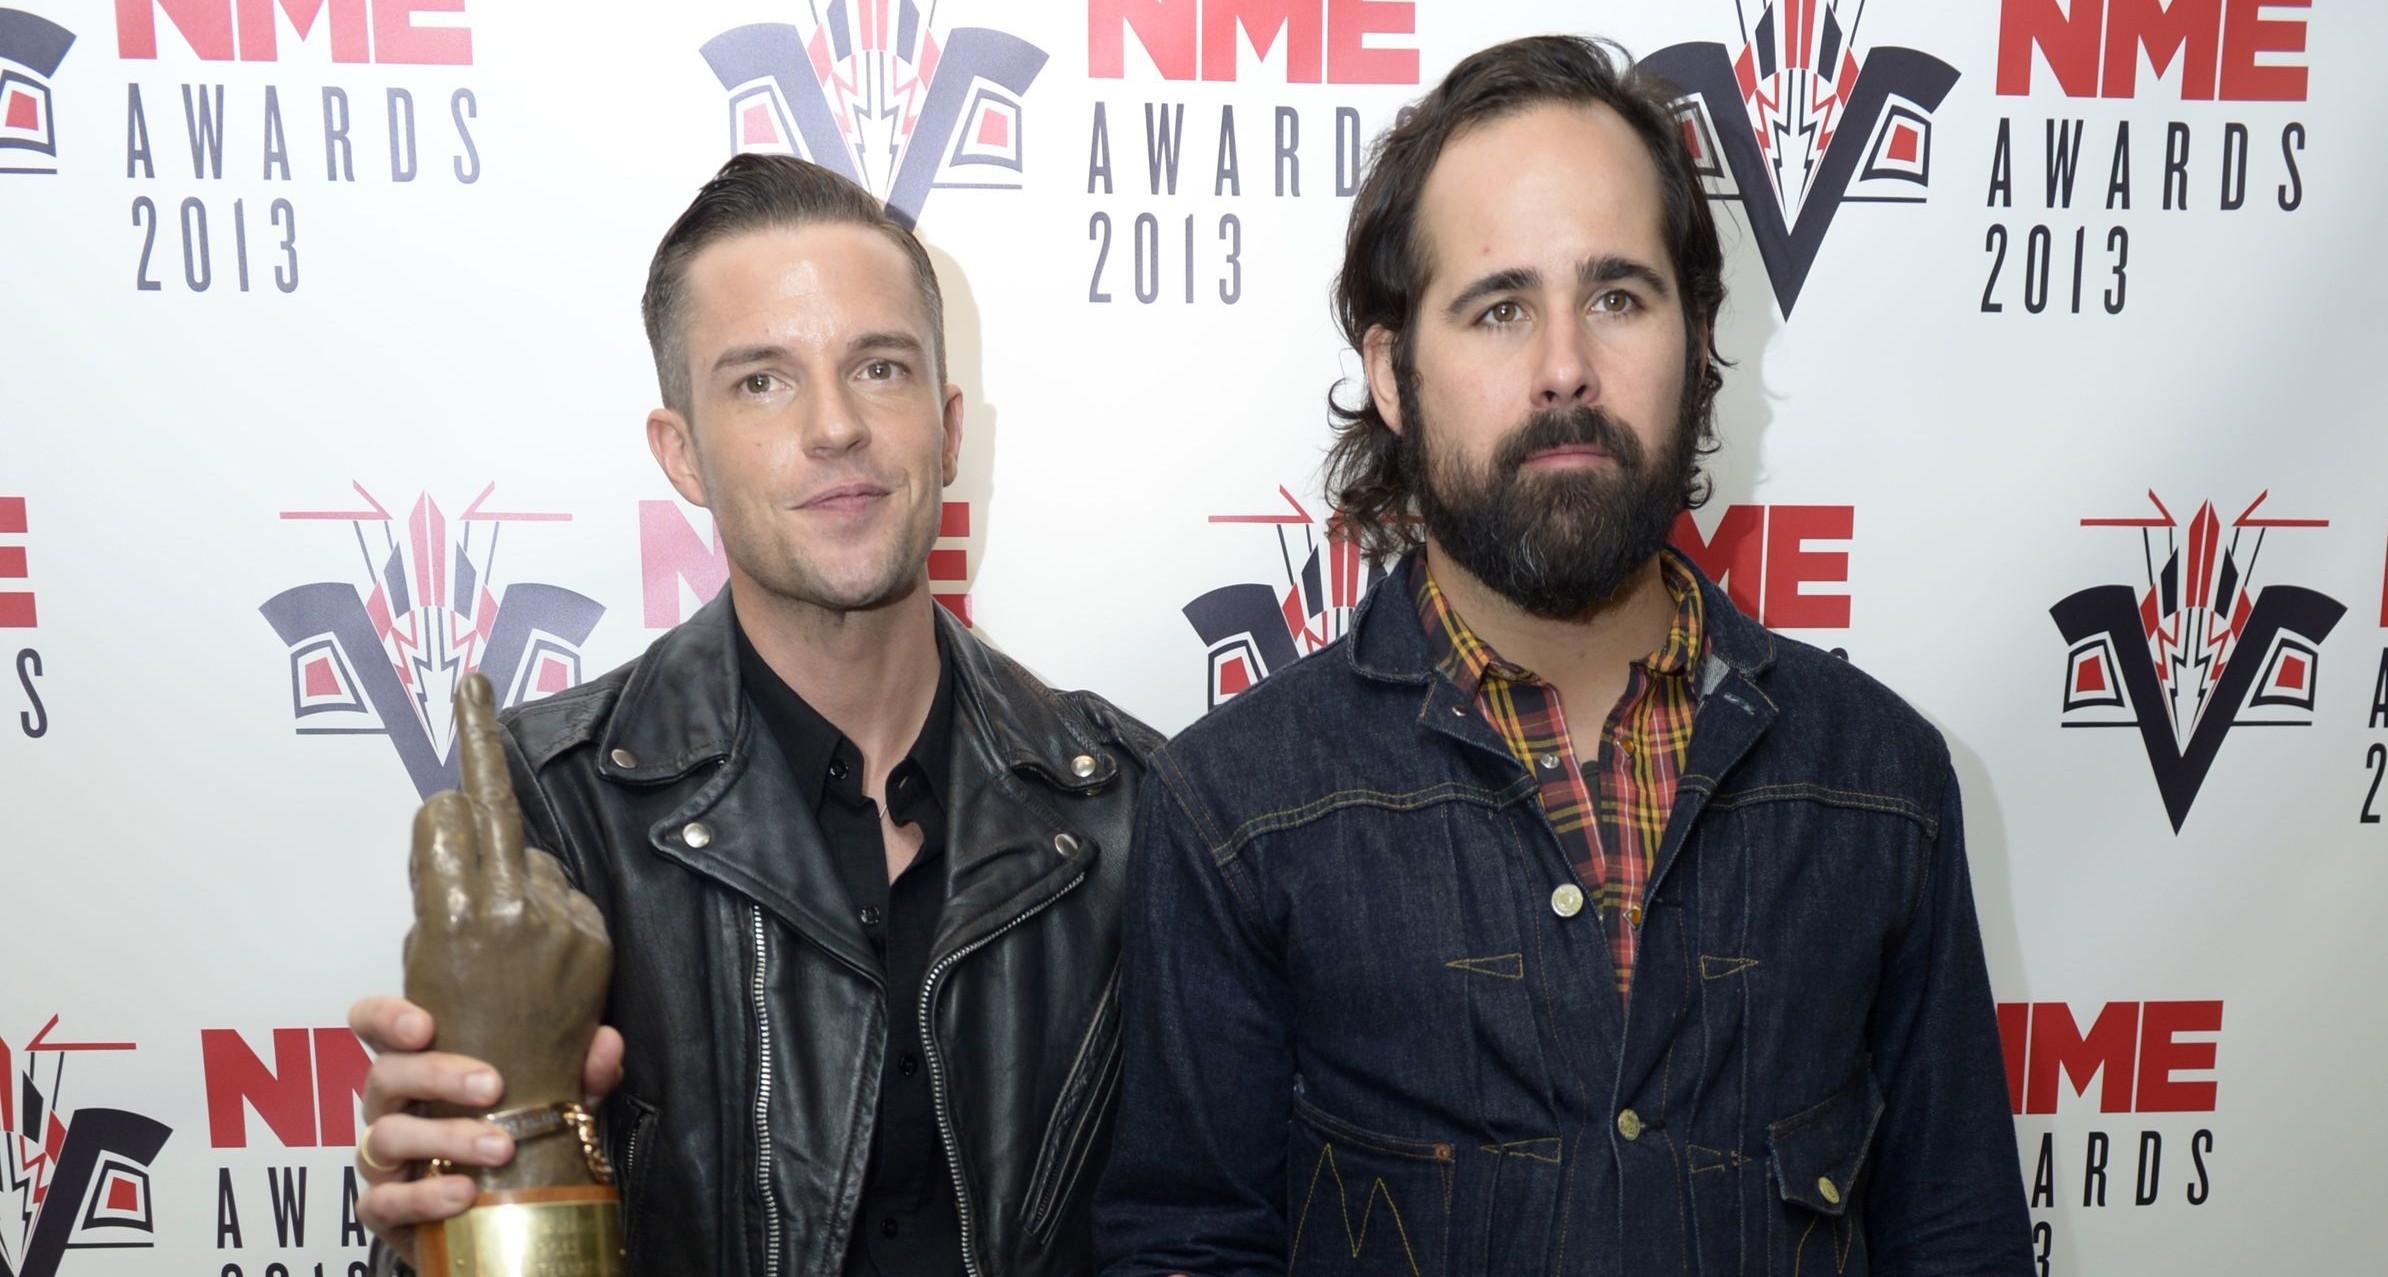 La band vince un NME Award come Best International Band